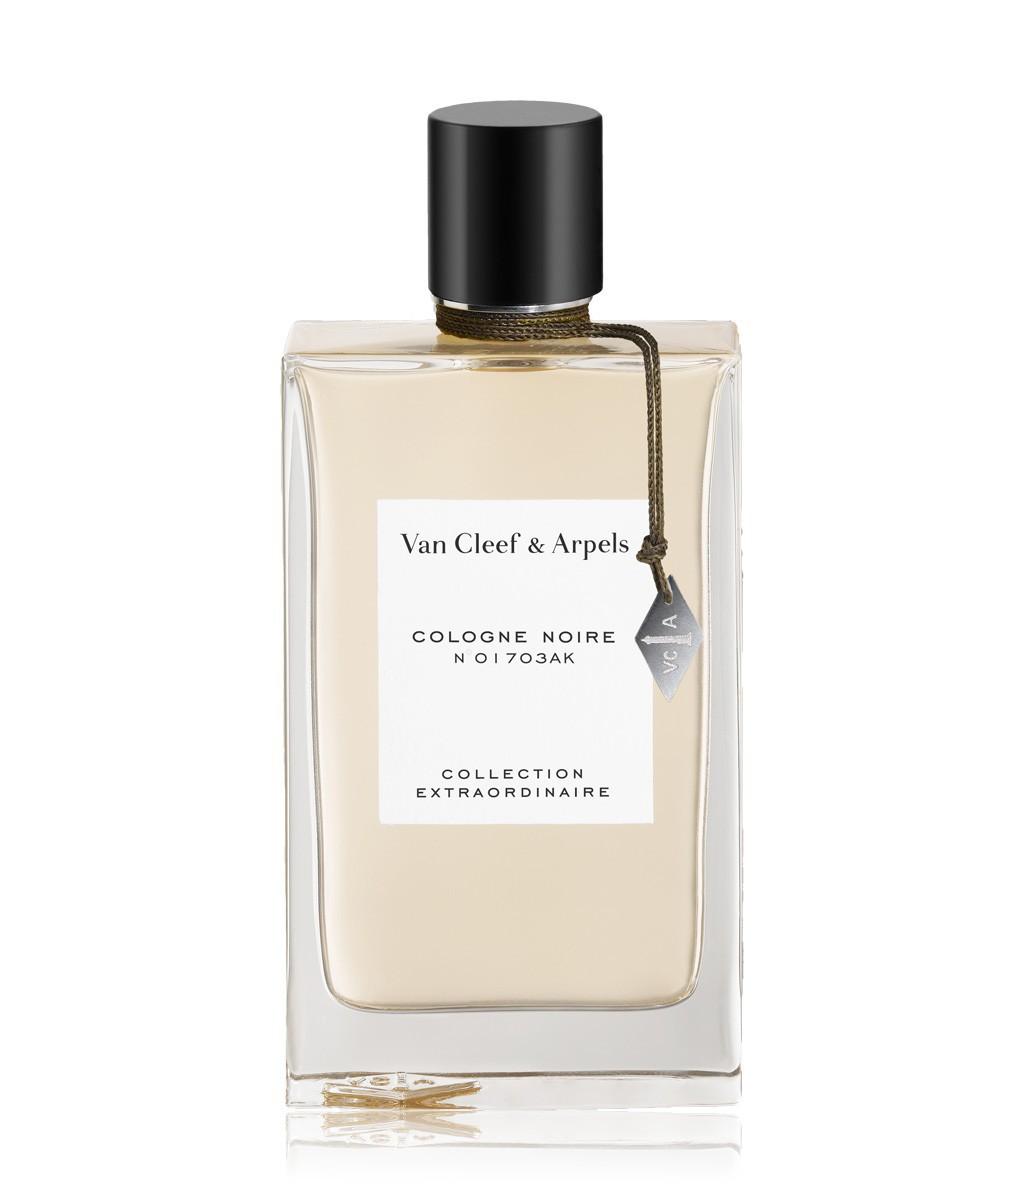 COLOGNE NOIRE by Van Cleef Arpel 5ml Travel Spray Perfume Mandarin Cardamom